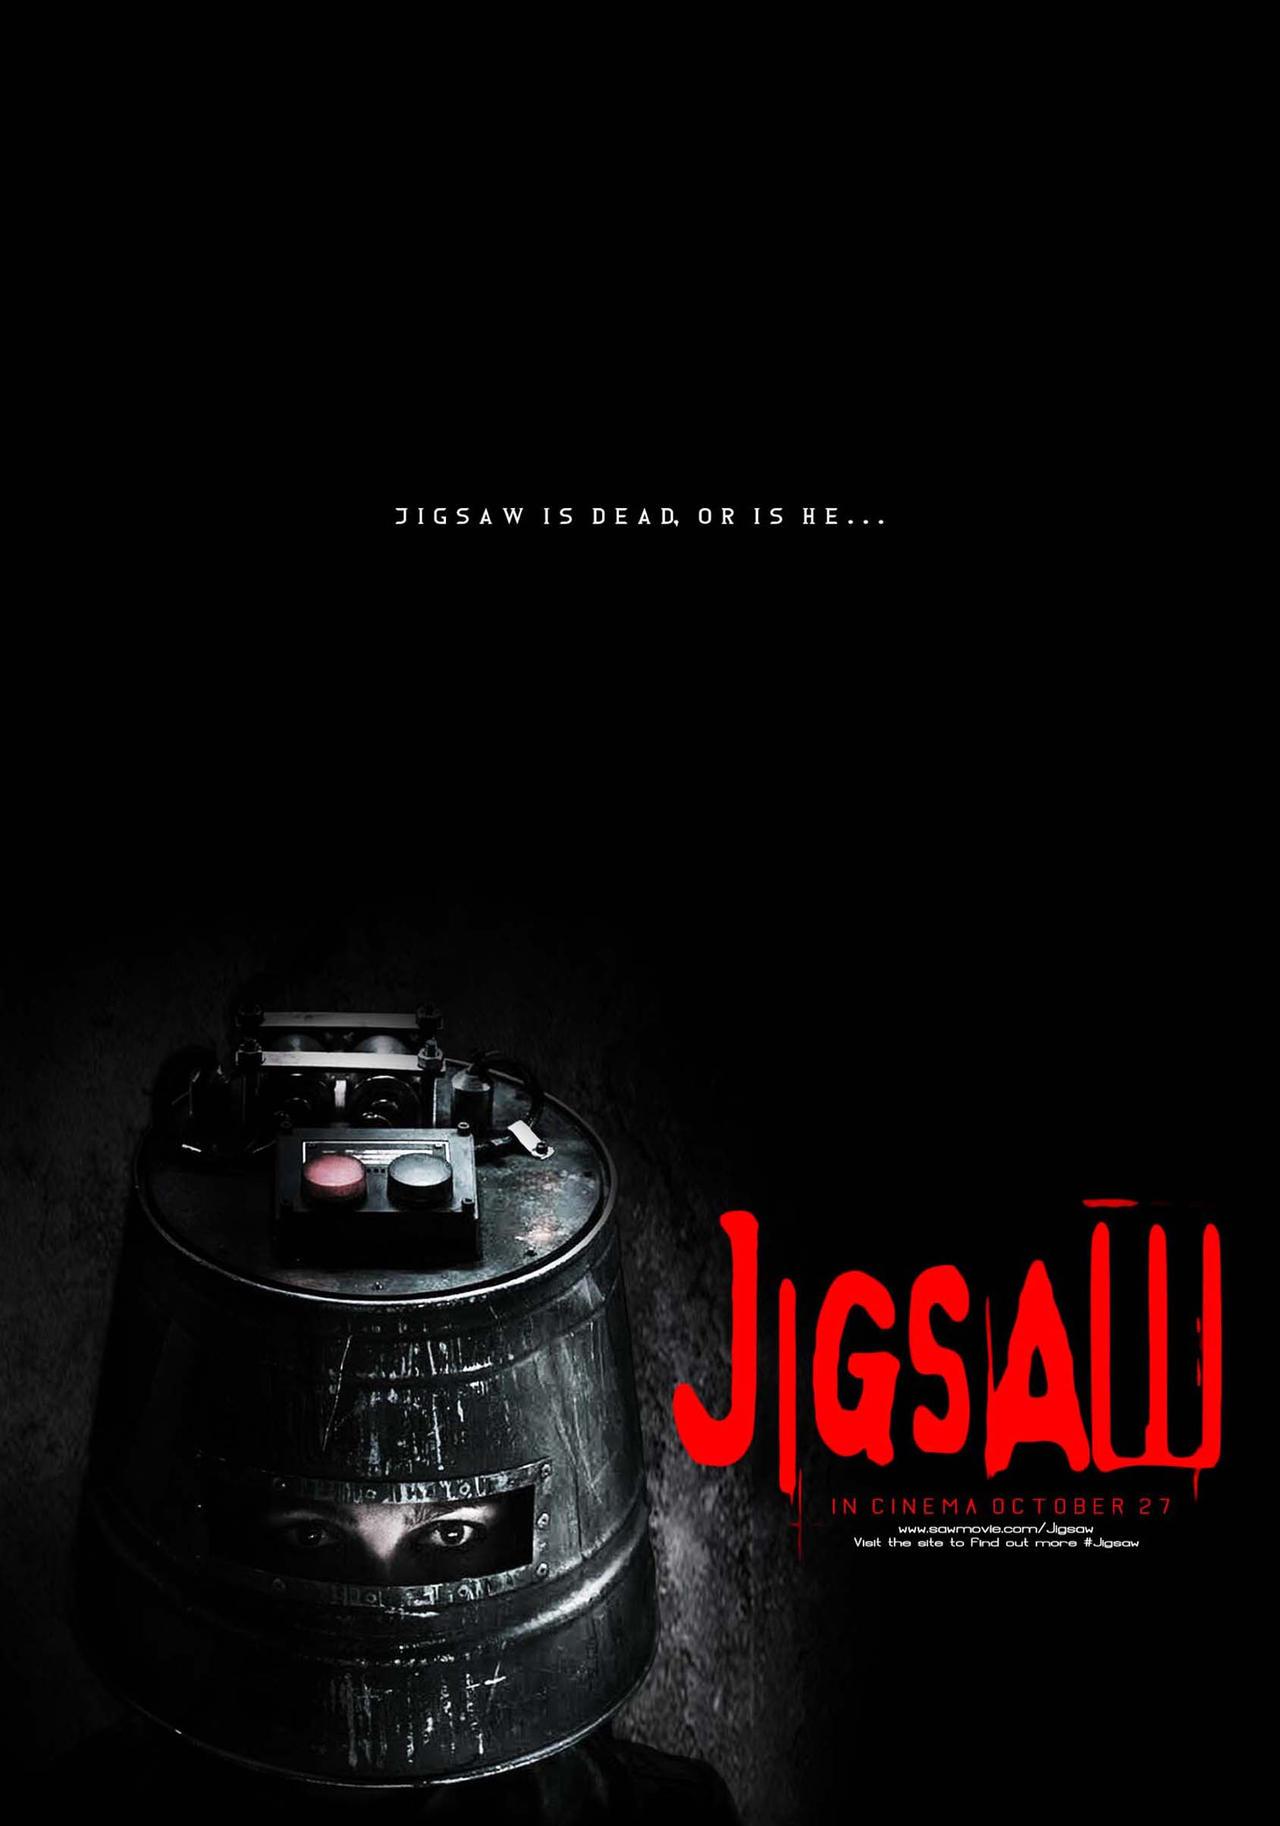 Jigsaw Movie Poster by lukeh01 on DeviantArt